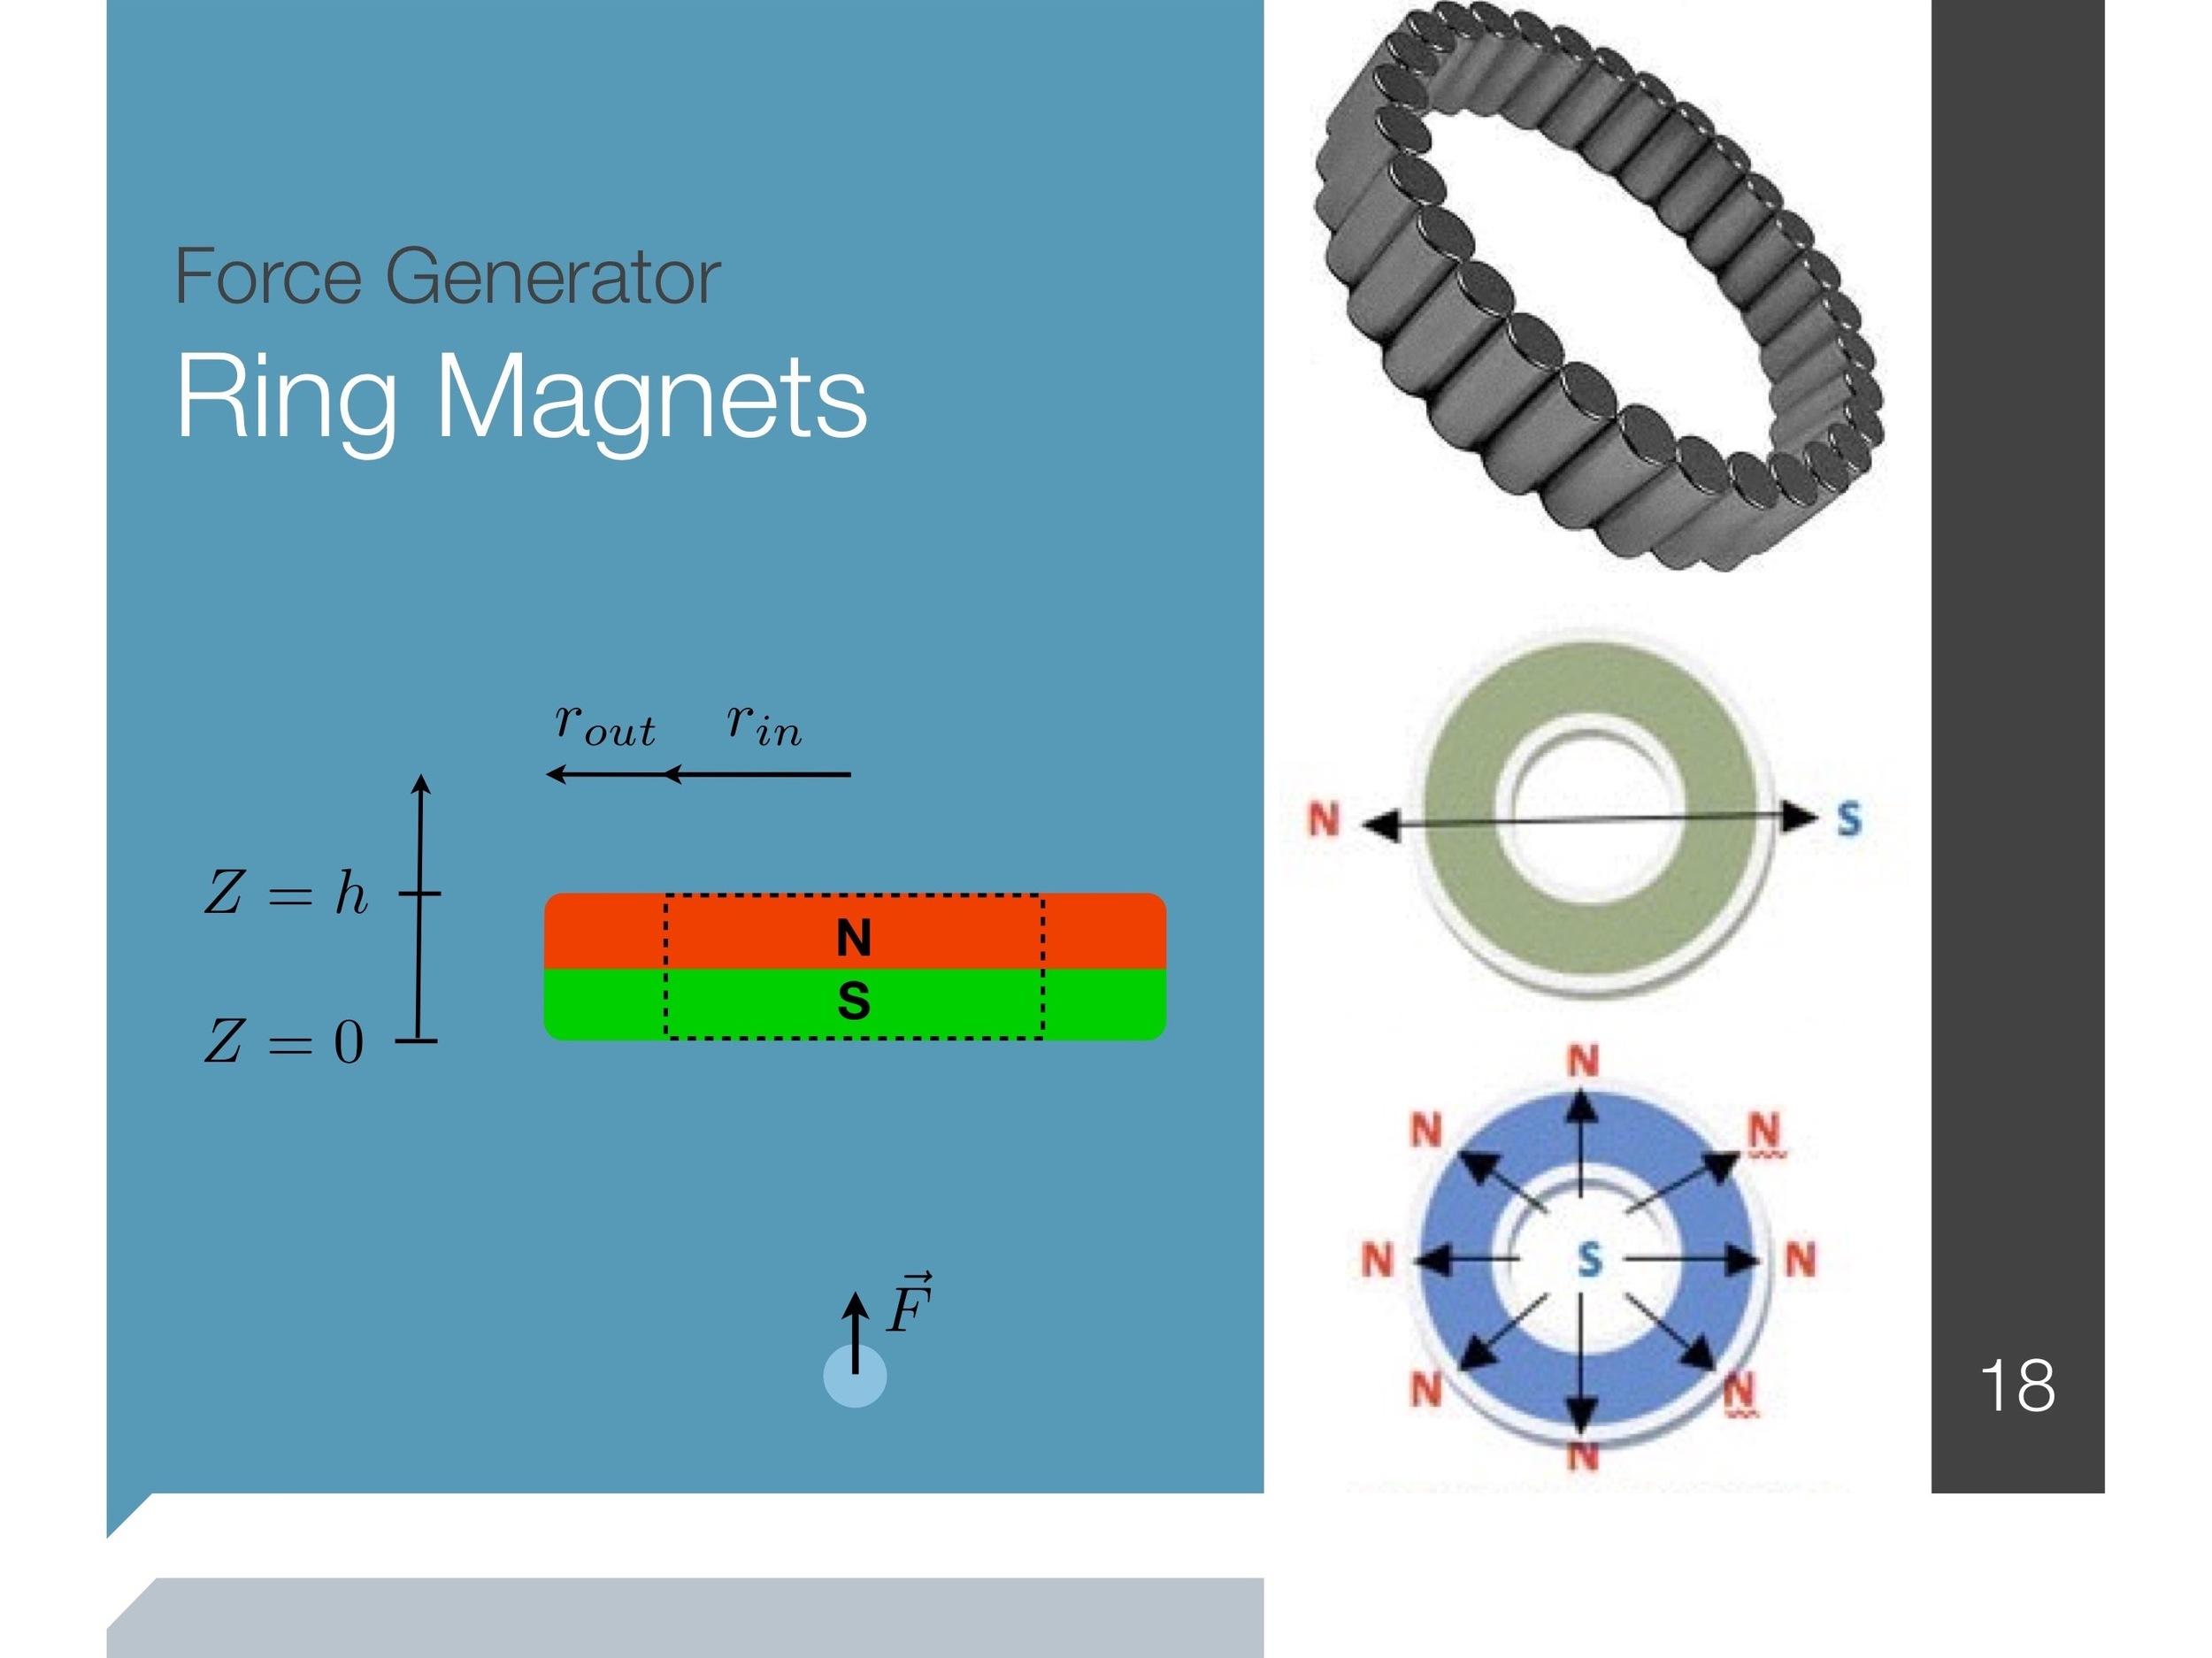 magnetic-tweezers_presentation 24 copy.jpeg